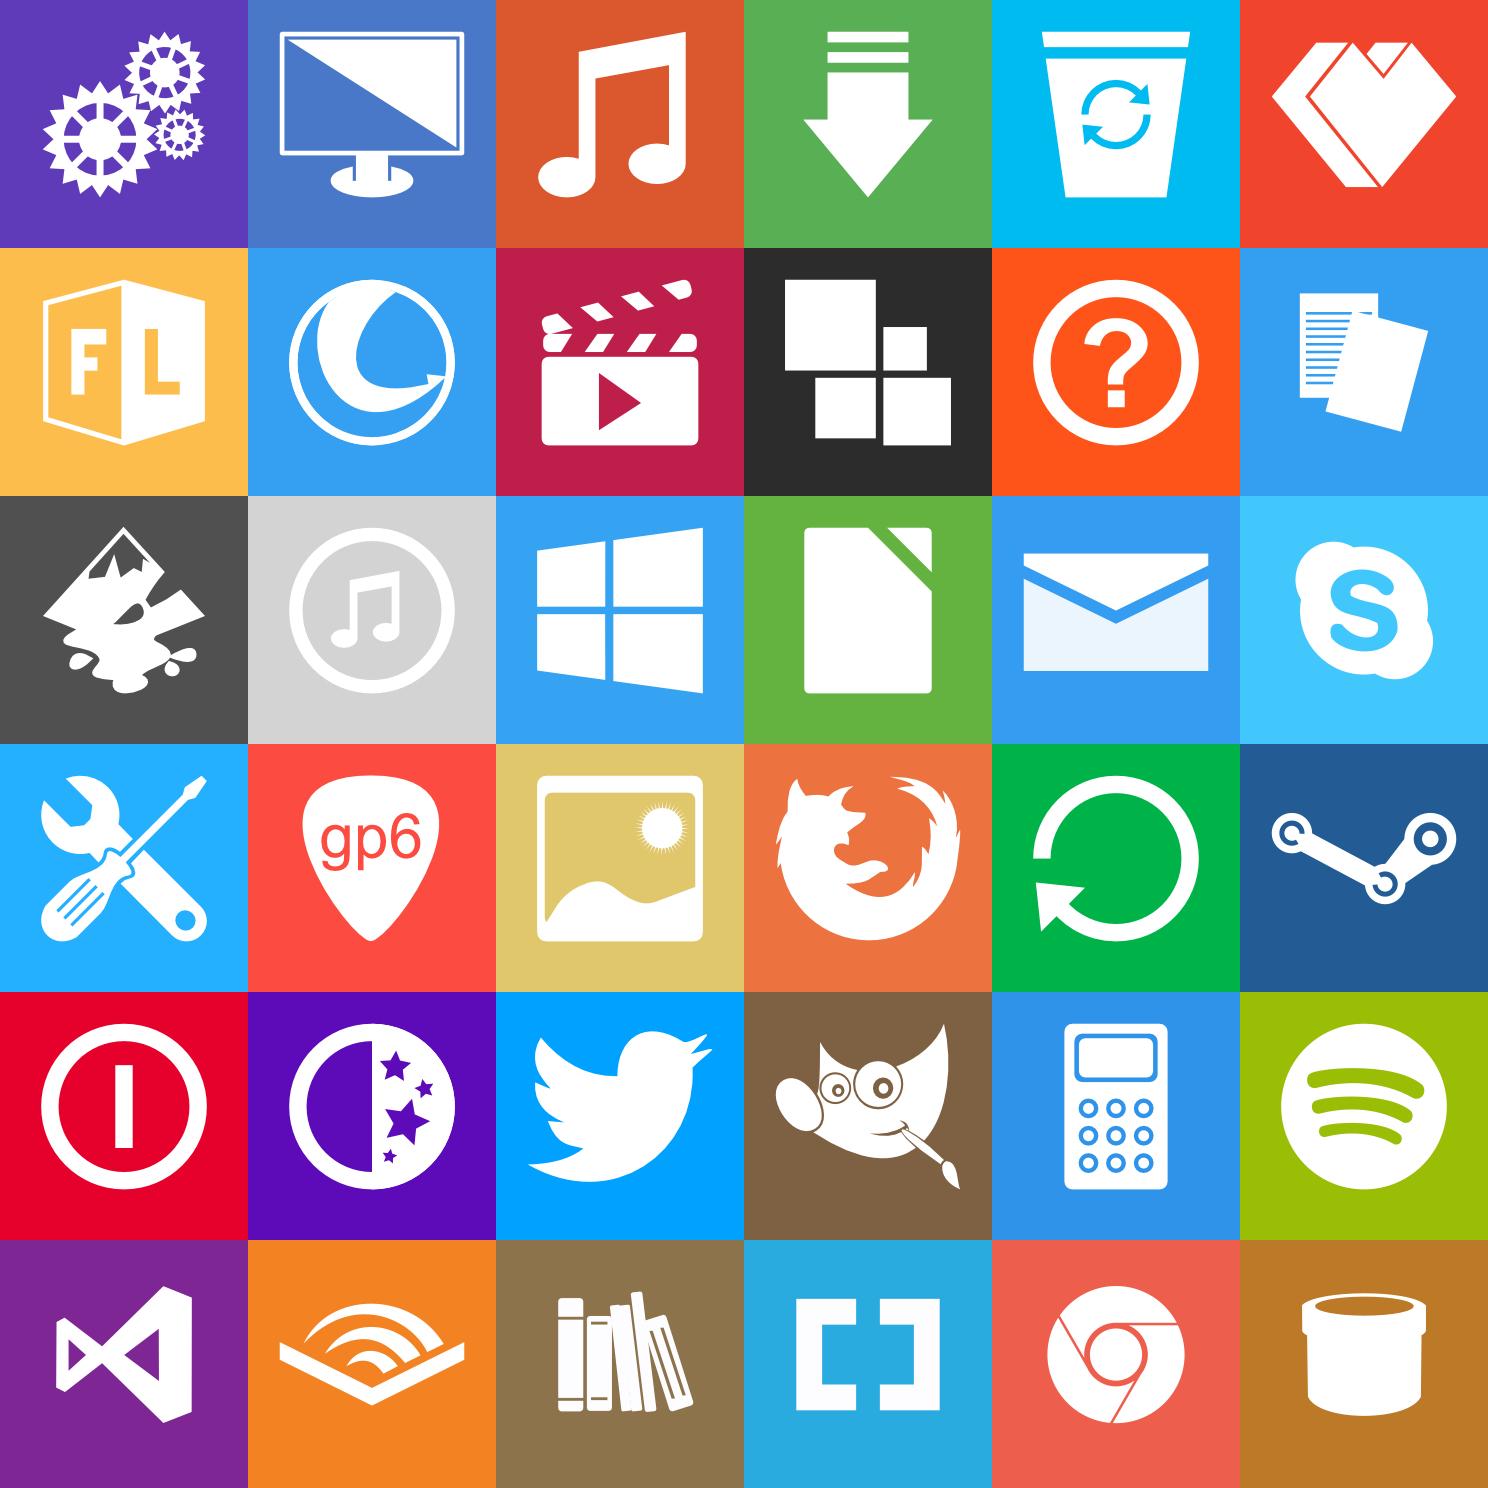 Custom Windows 8 Metro Icons Gallery Diagram Writing Sample Ideas And Guide